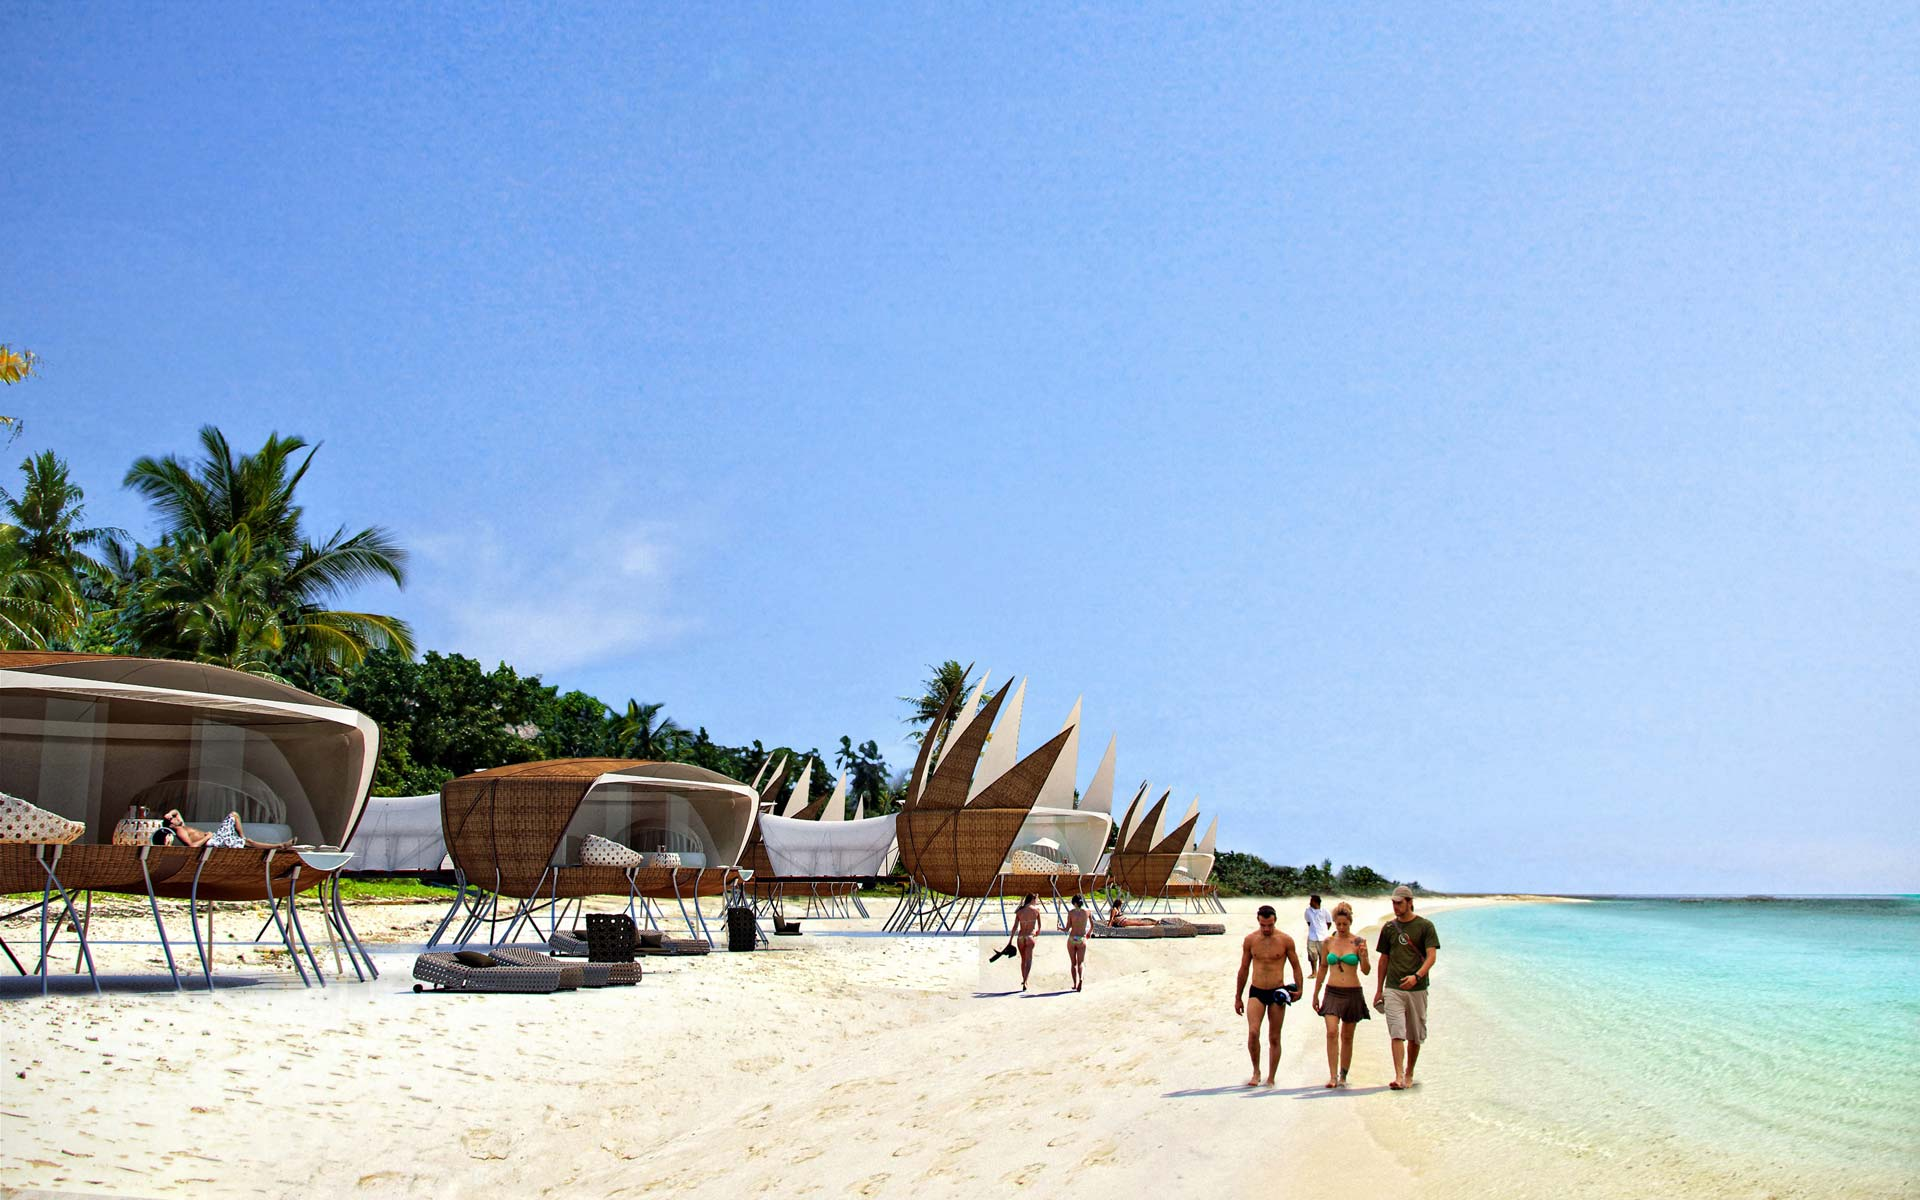 glamping arquitectura desmontable, hospitality, cabañas desde la playa